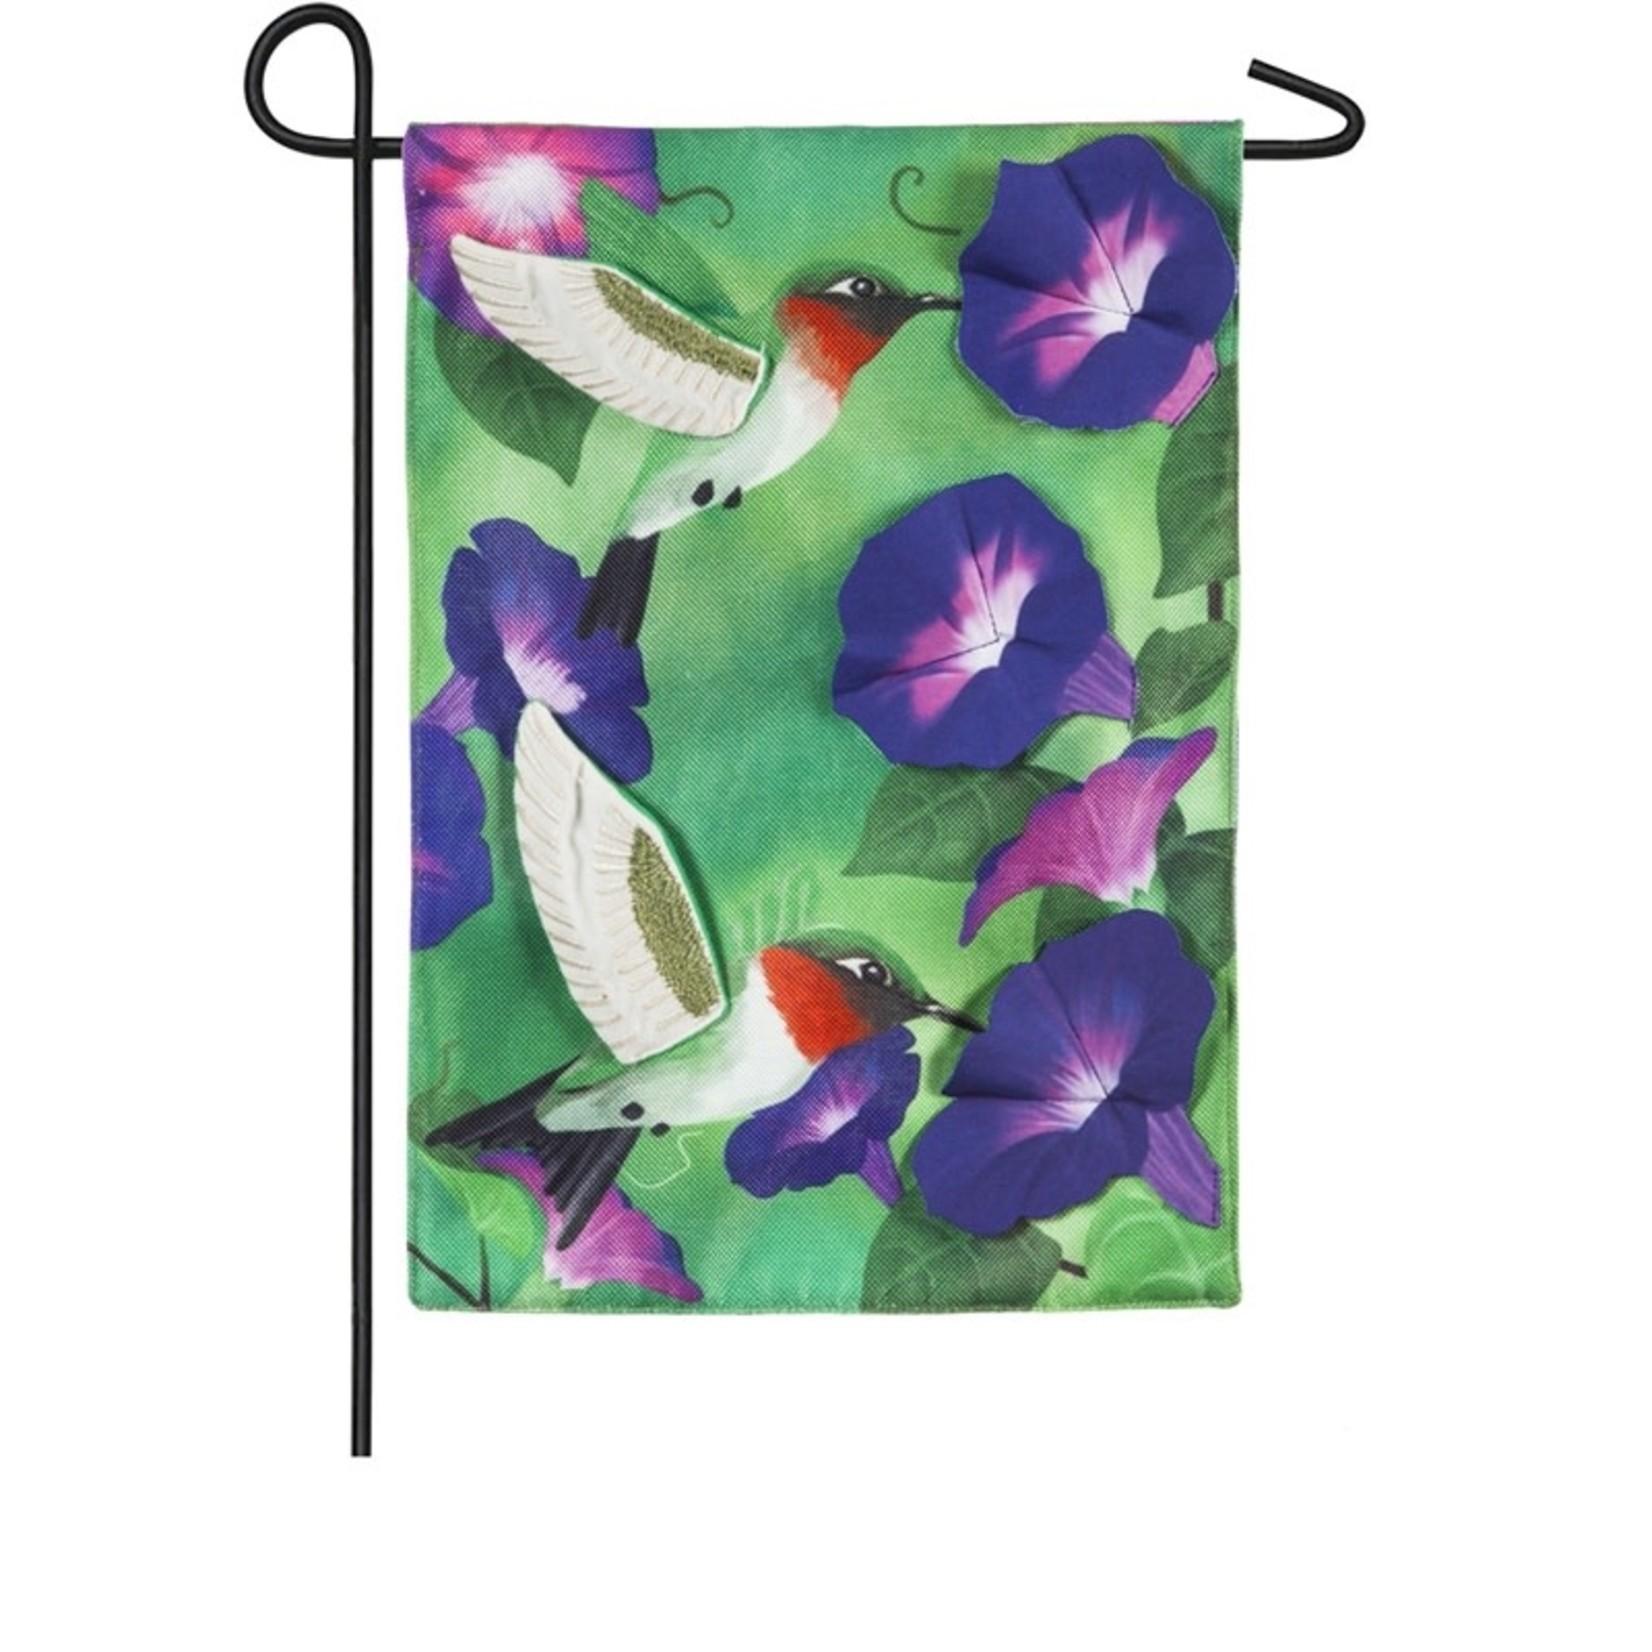 GARDEN FLAG MORNING GLORY HUMMINGBIRDS